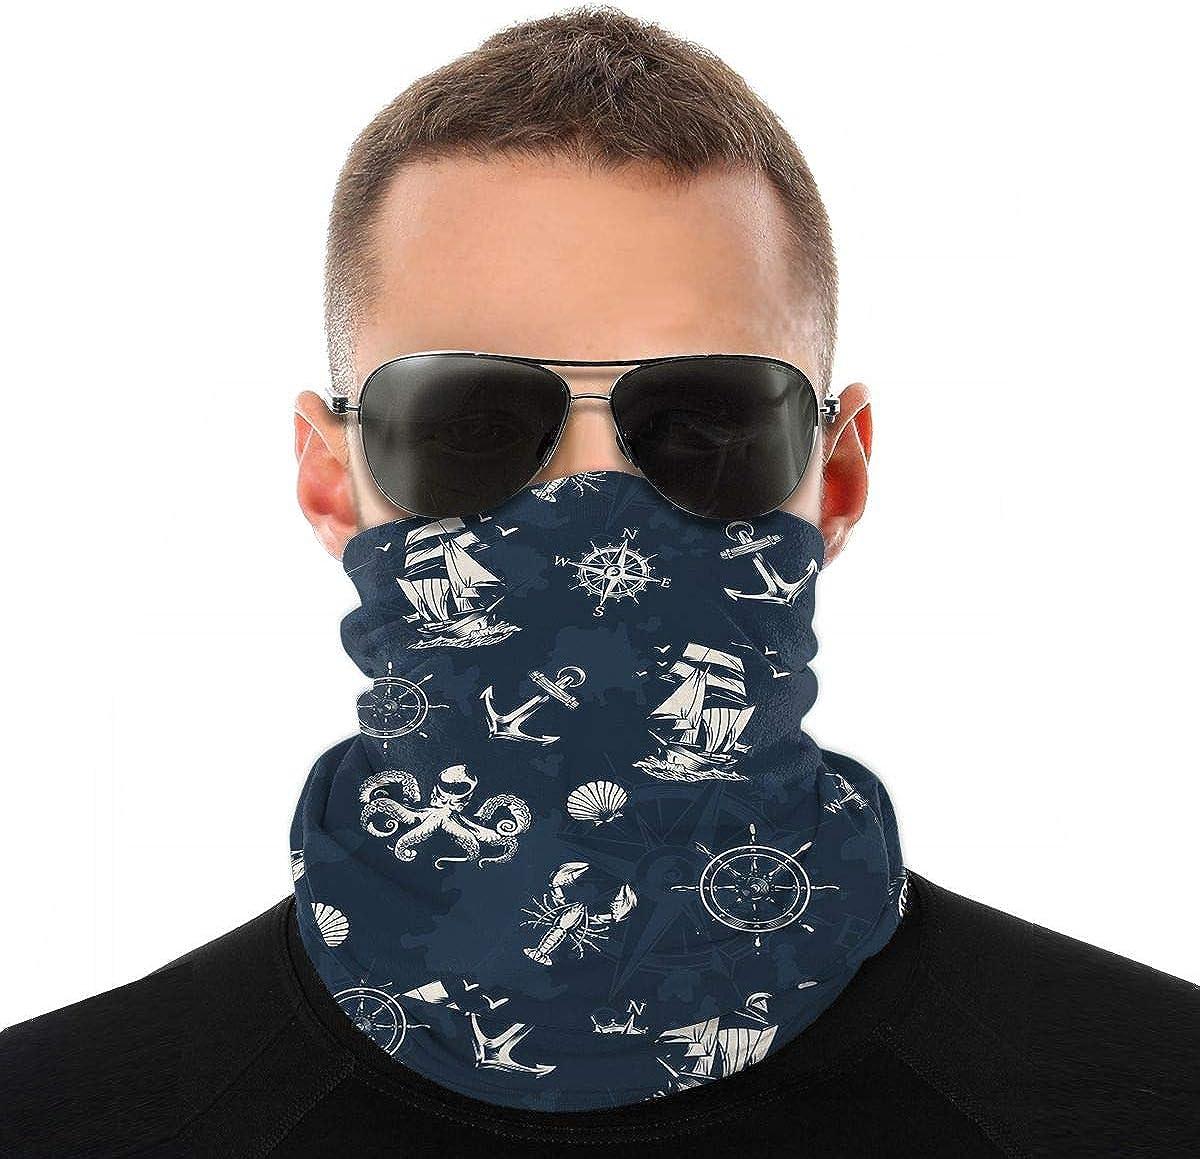 KiuLoam Bandanas Face Mask, Vintage Sea Anchor Compass Wheel Octopus Neck Gaiter Mask Headband for Men Women Face Scarf Dust, Outdoors, Sports